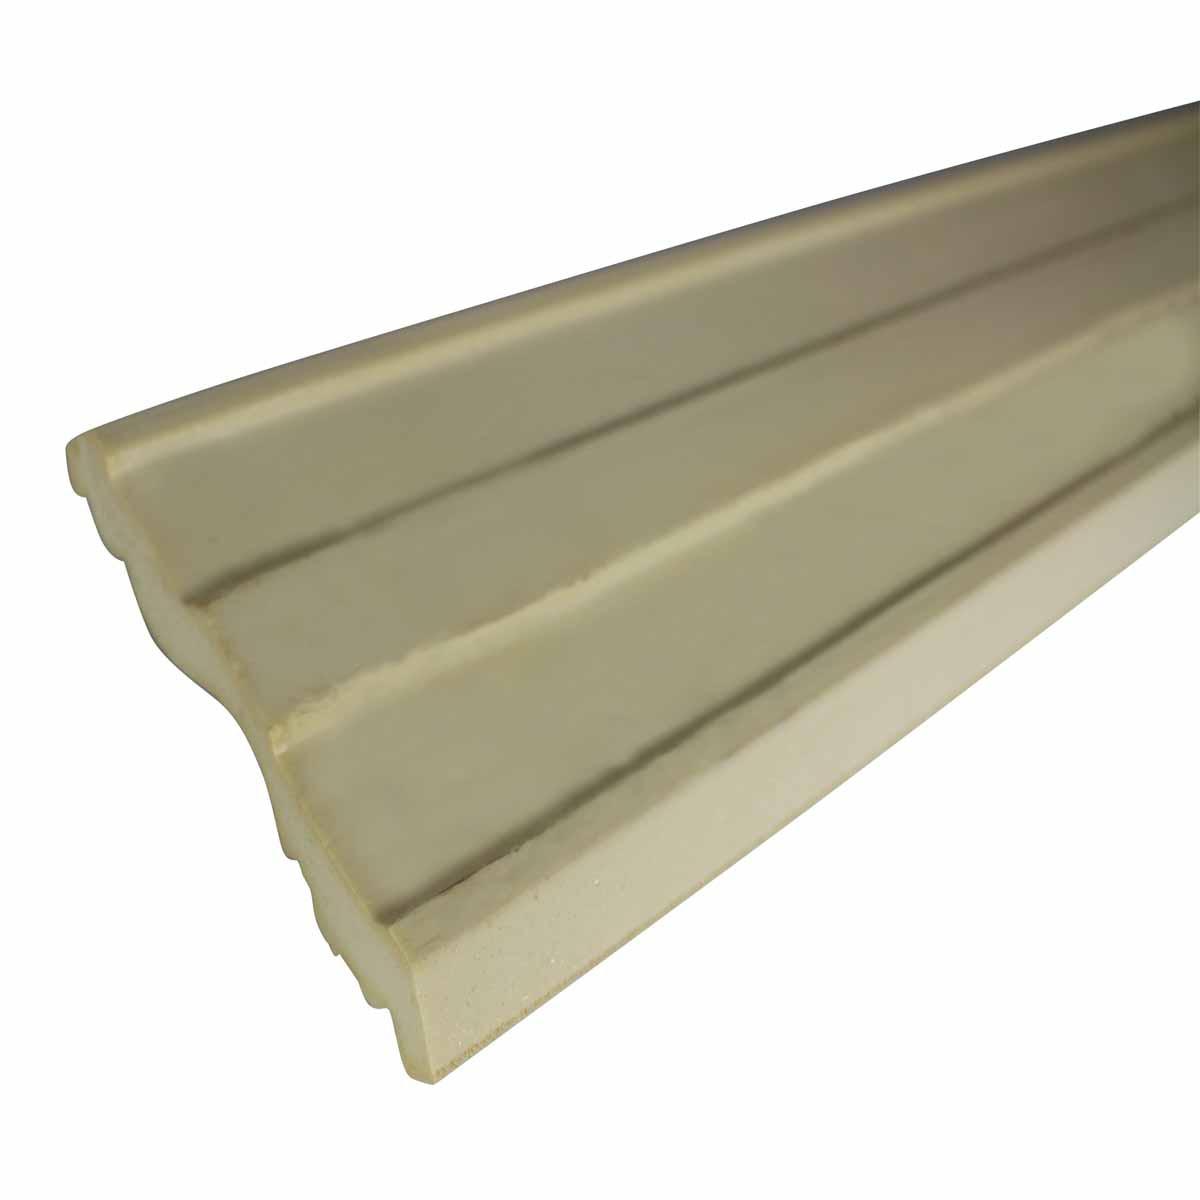 Cornice White Urethane Sample of 10991 23.5 Long Cornice Cornice Moulding Cornice Molding